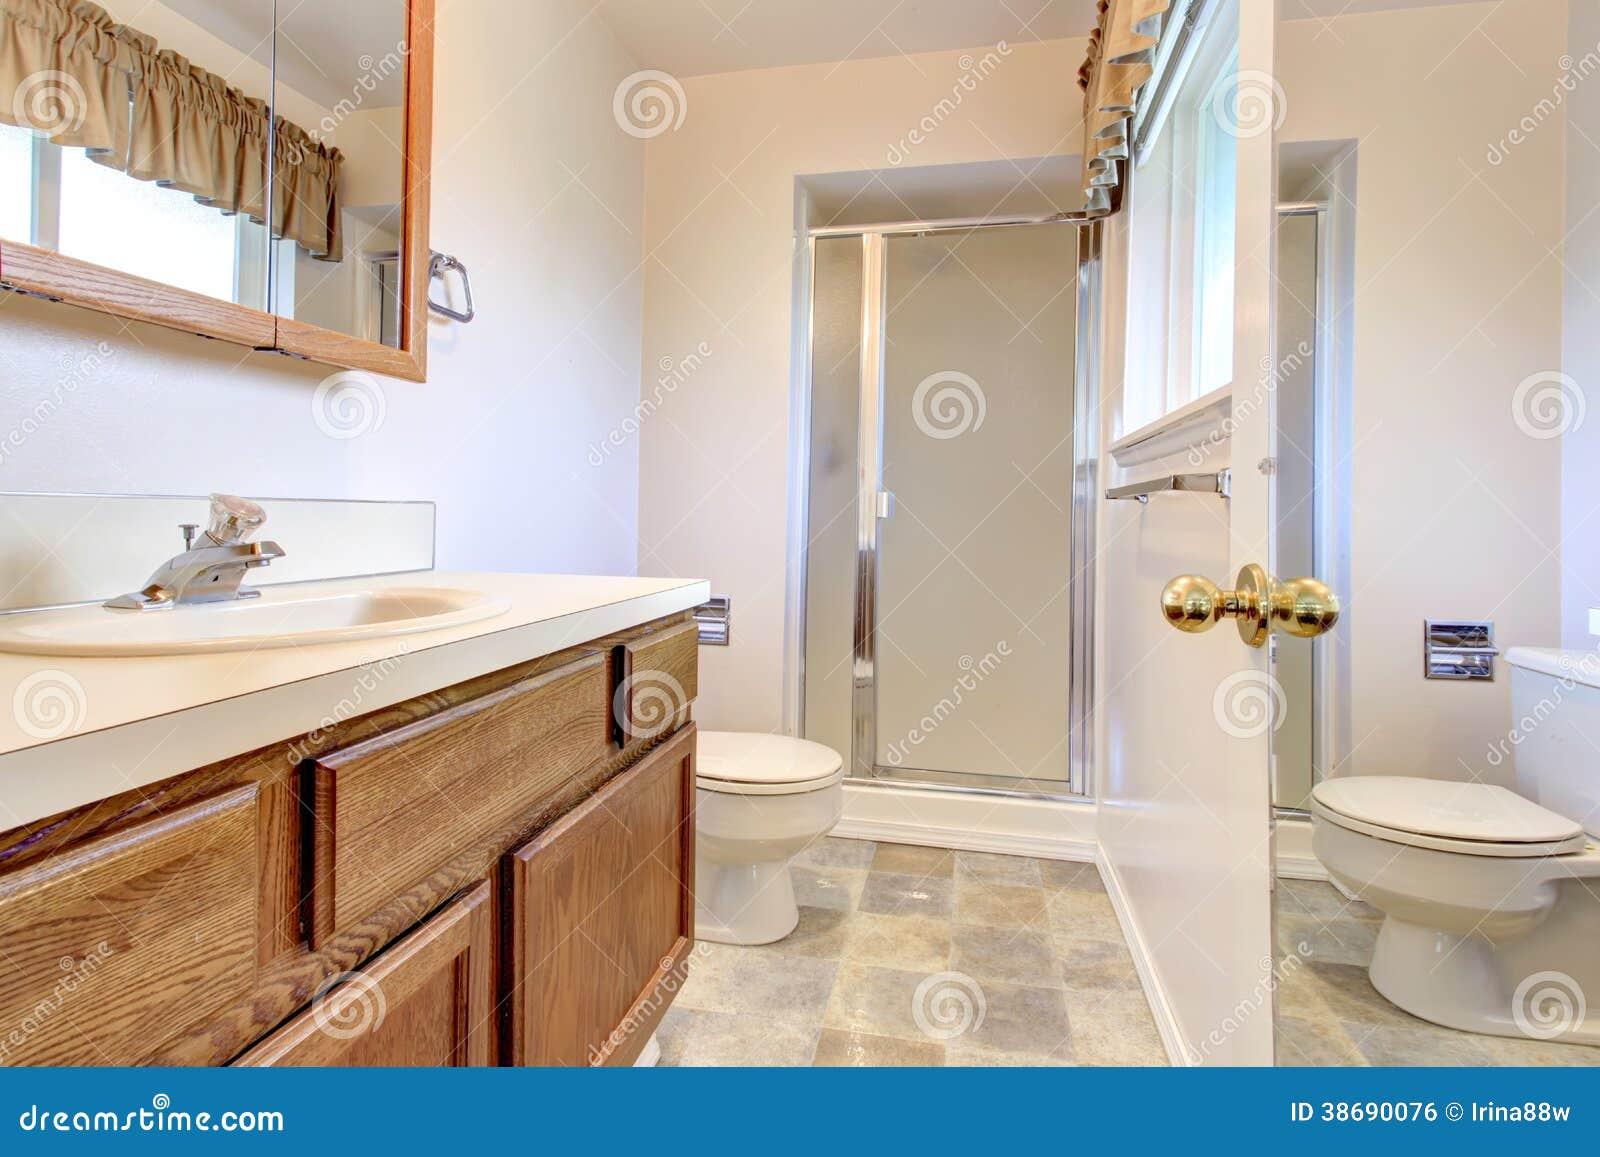 Gabinete Para Baño Una Puerta Inval:White Bathroom Wall Cabinet with Glass Doors